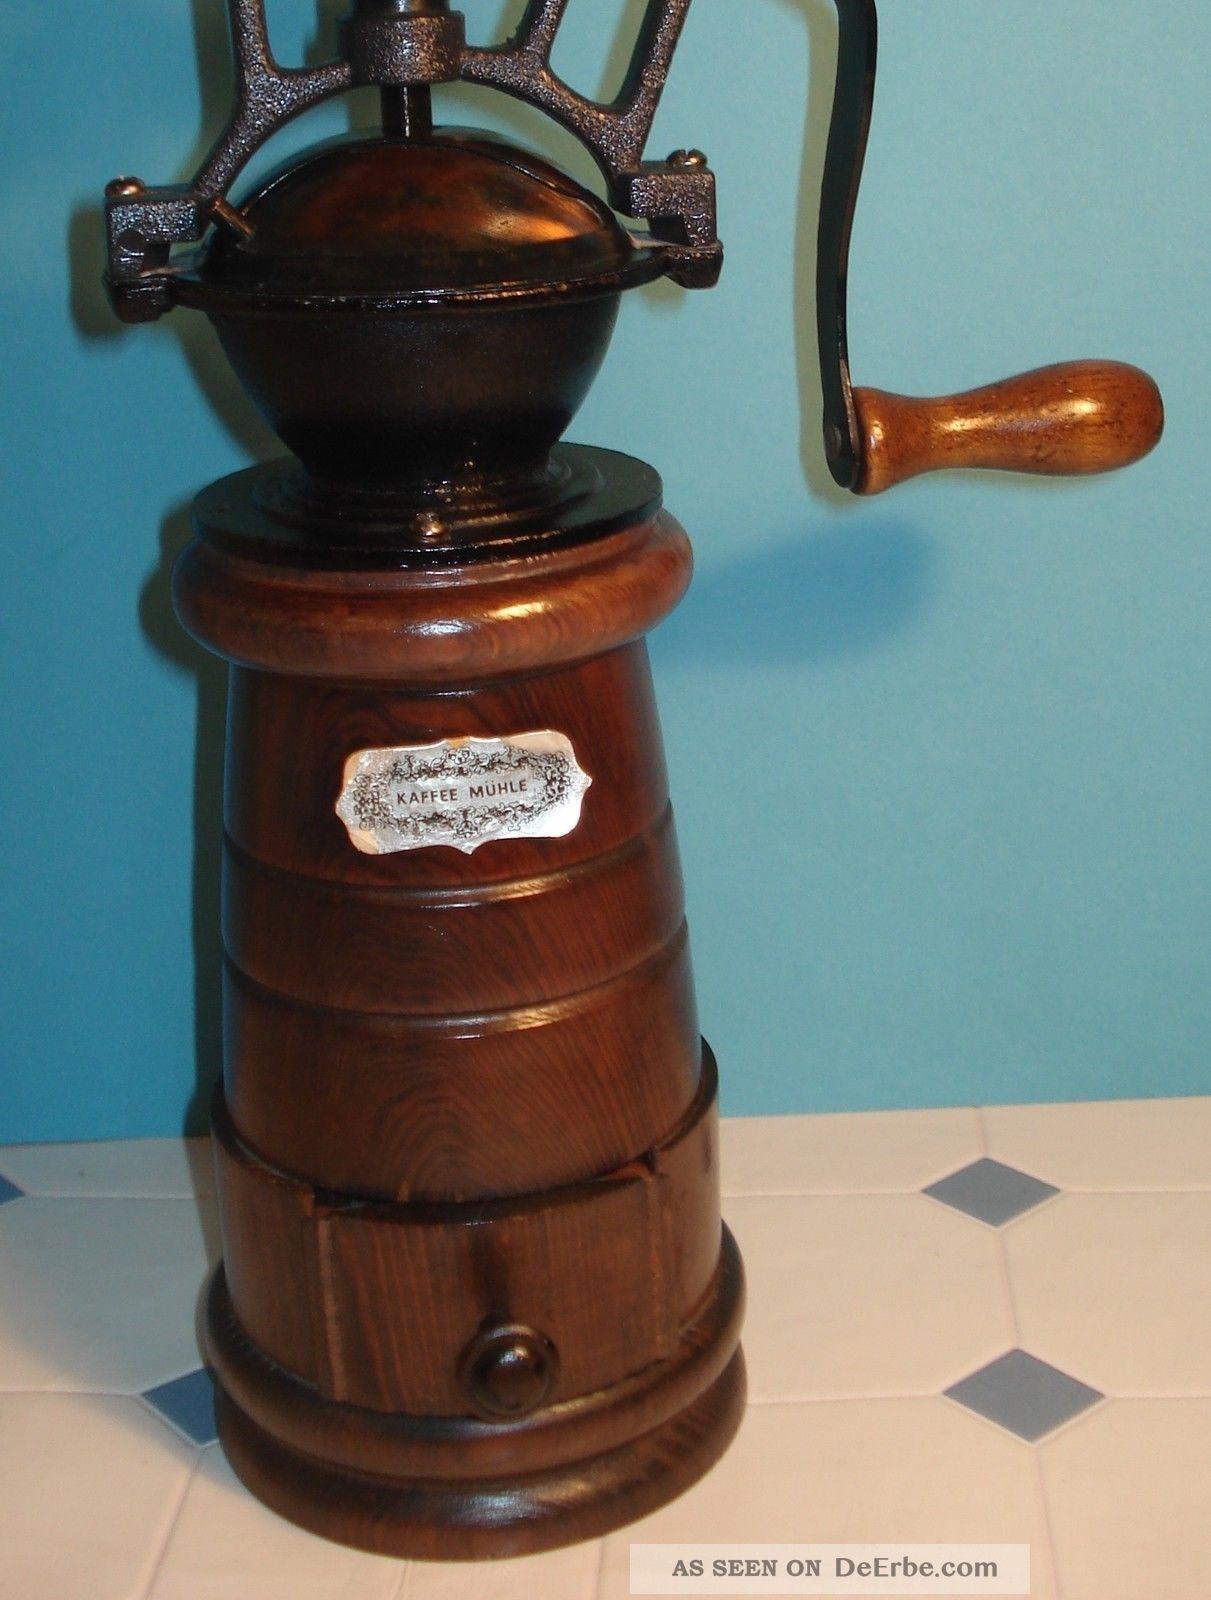 Alte manuelle kaffeem hle aus rustikalem holz mit kurbel for Alte barhocker aus holz